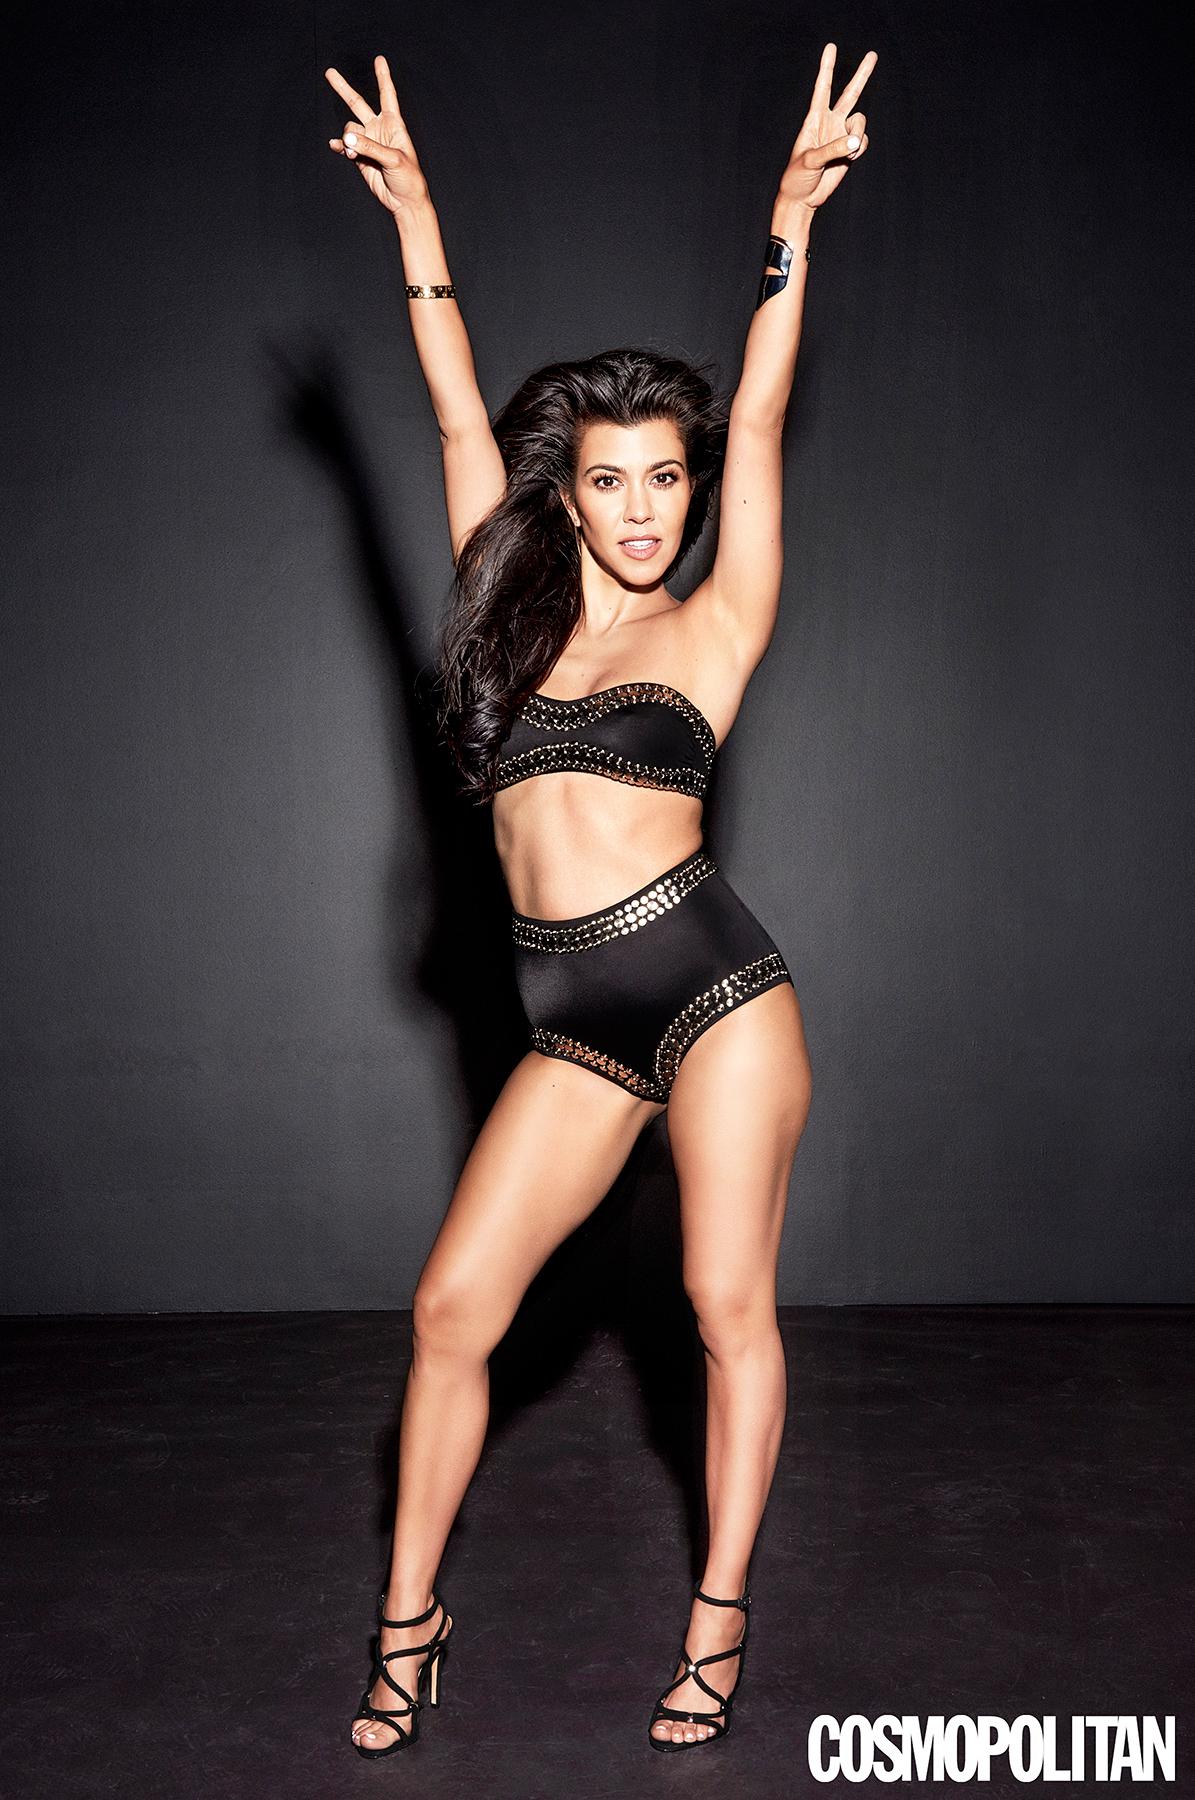 Kourtney Kardashian in Cosmopolitan